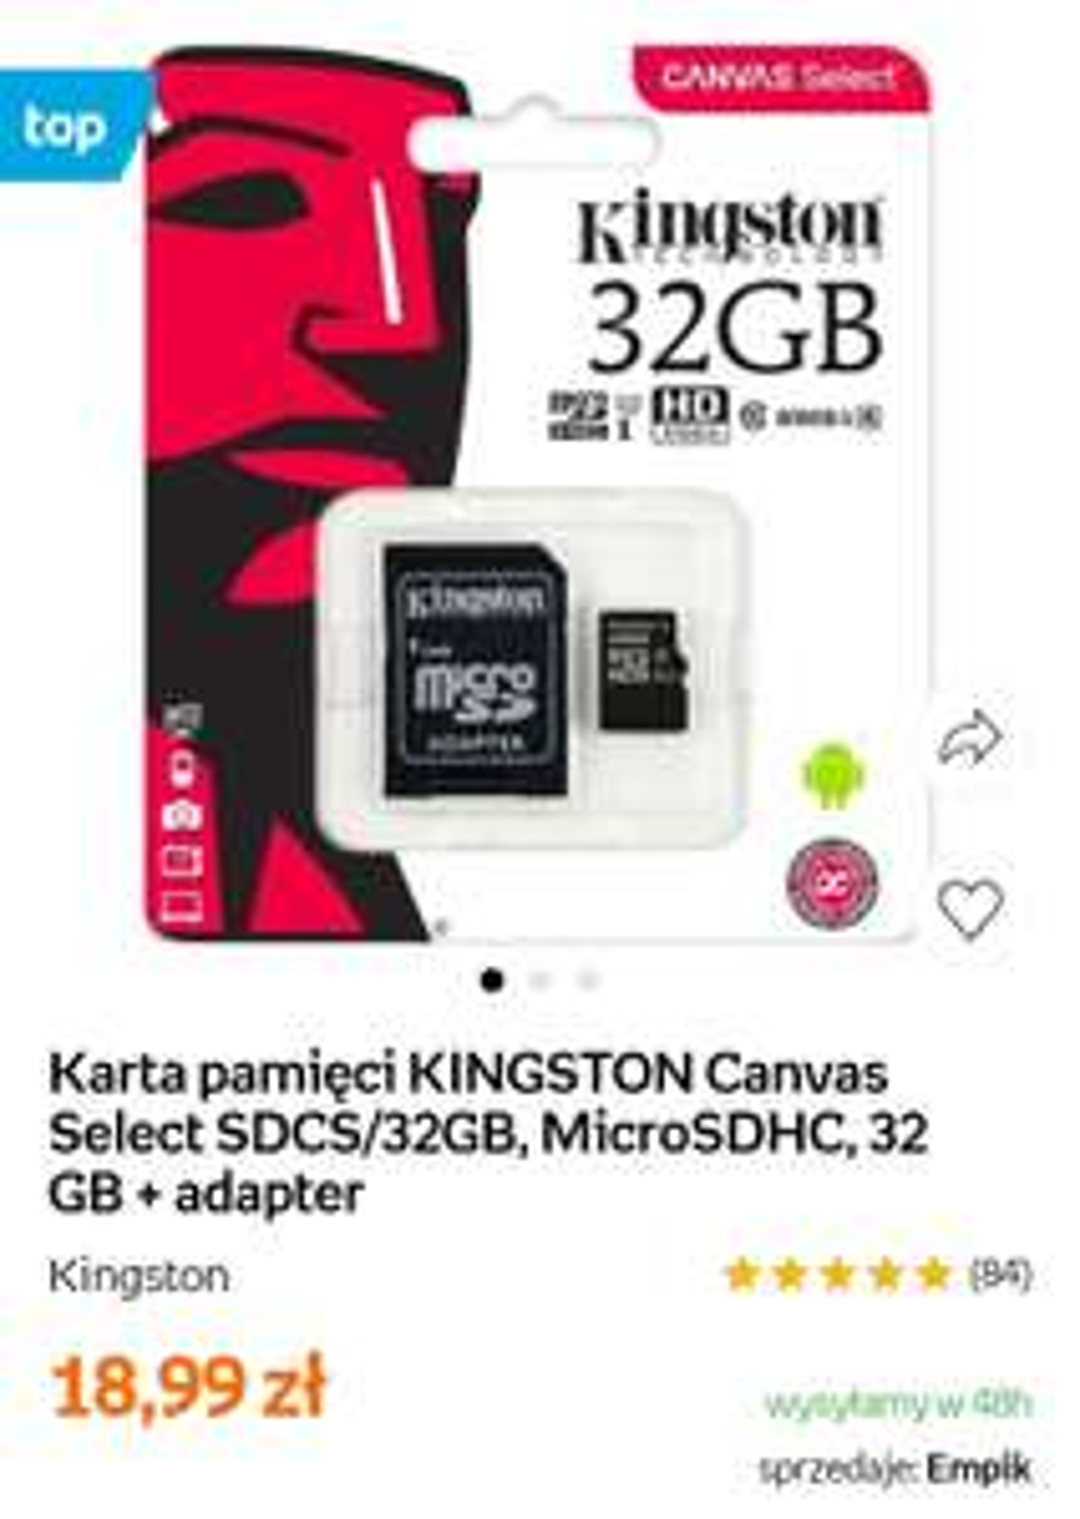 Karta Pamięci Kingston 32 GB - Empik